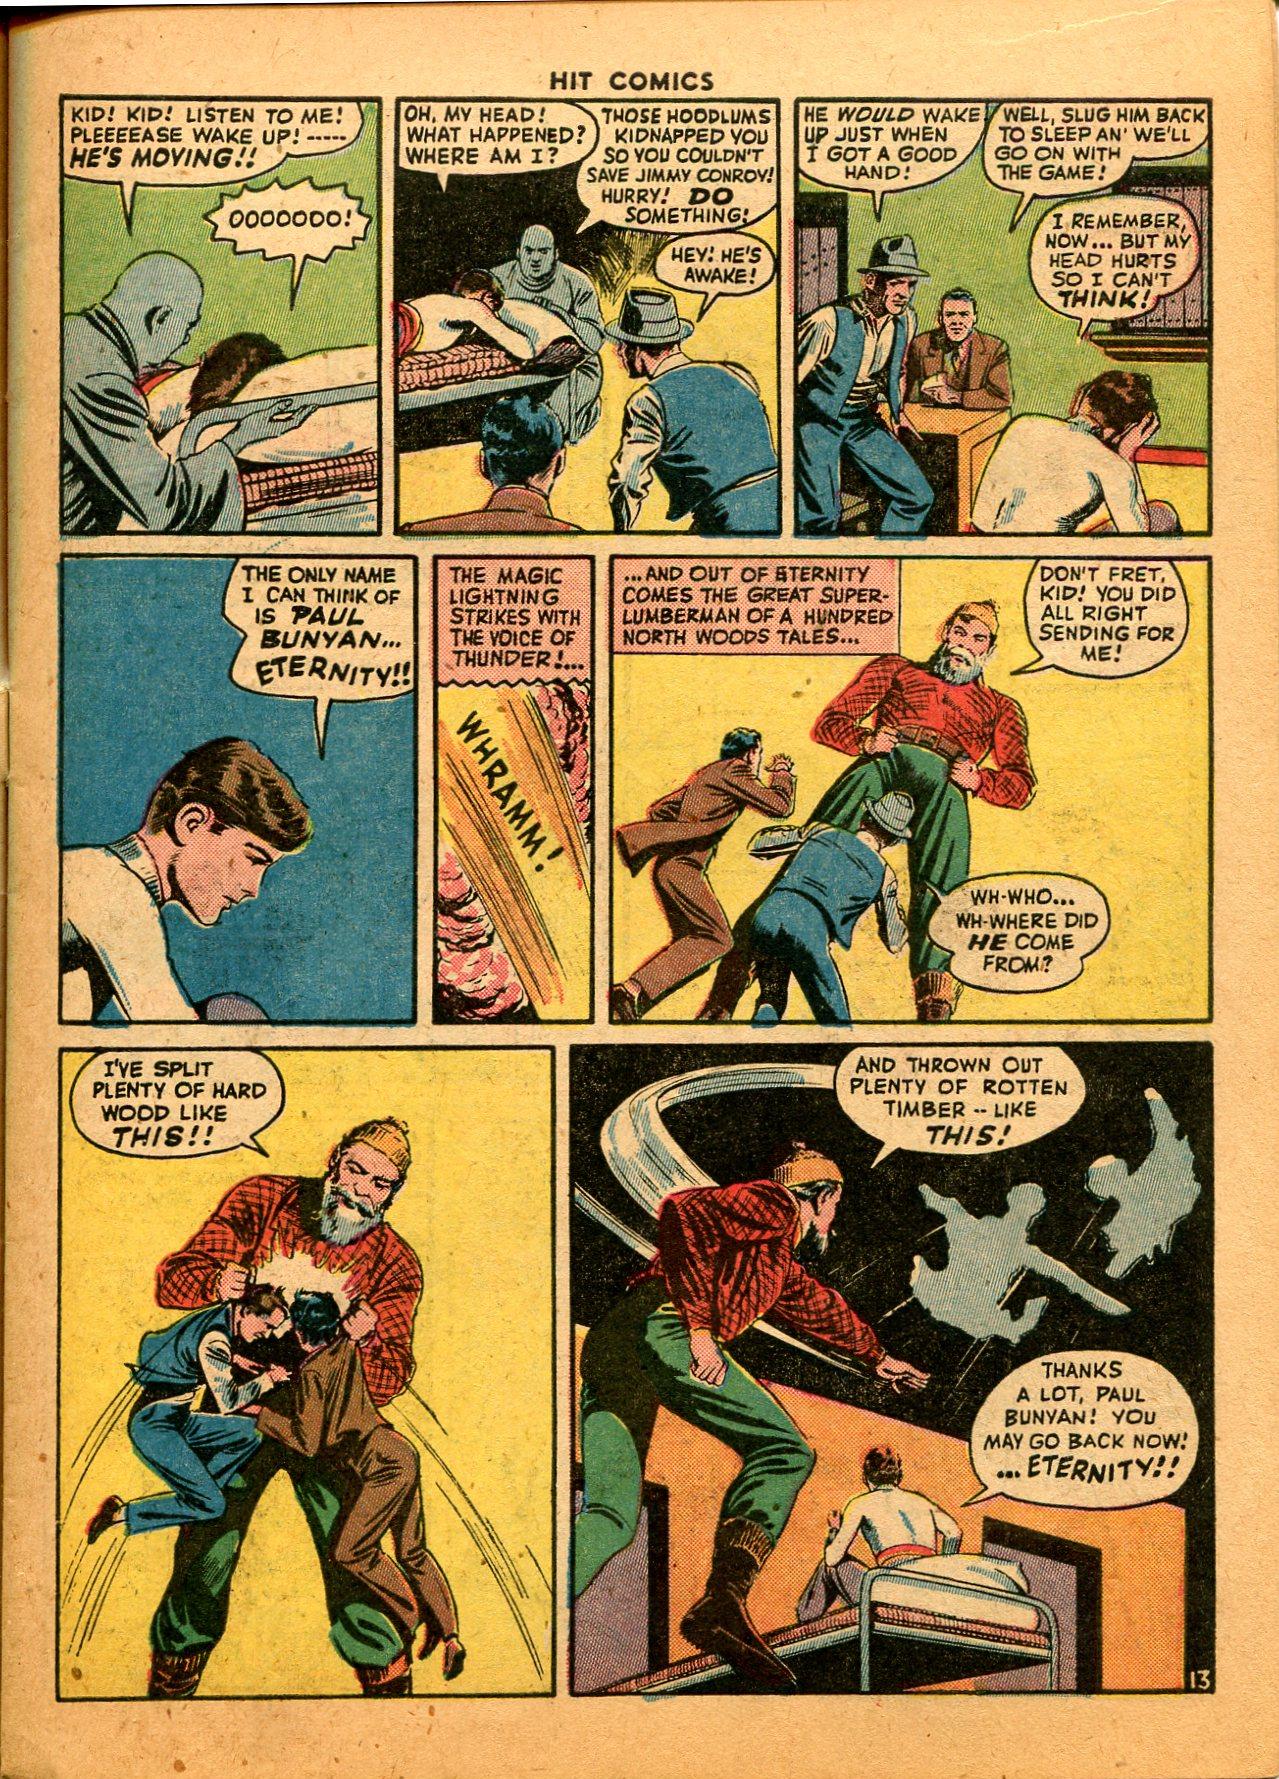 Read online Hit Comics comic -  Issue #35 - 15